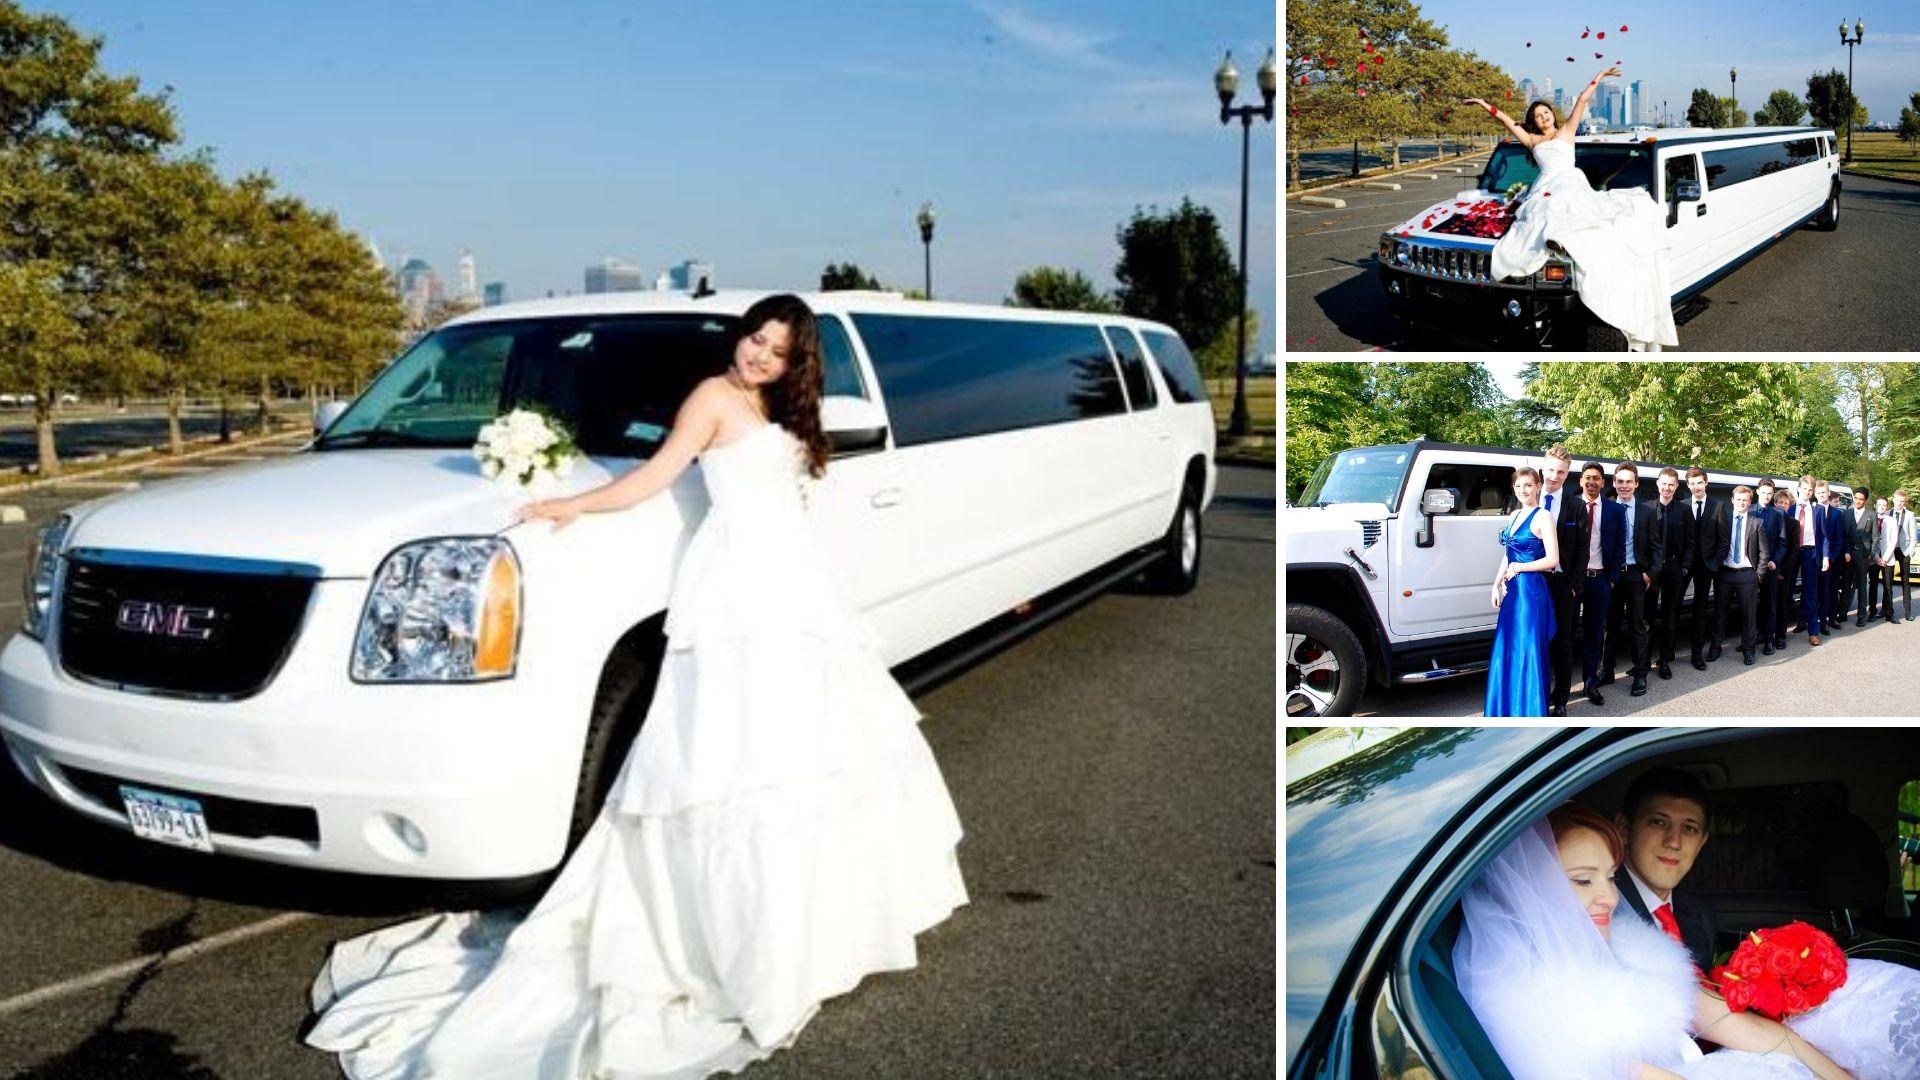 New York Wedding Limousine Service Wedding Limo Service Wedding Limo Ny Trip